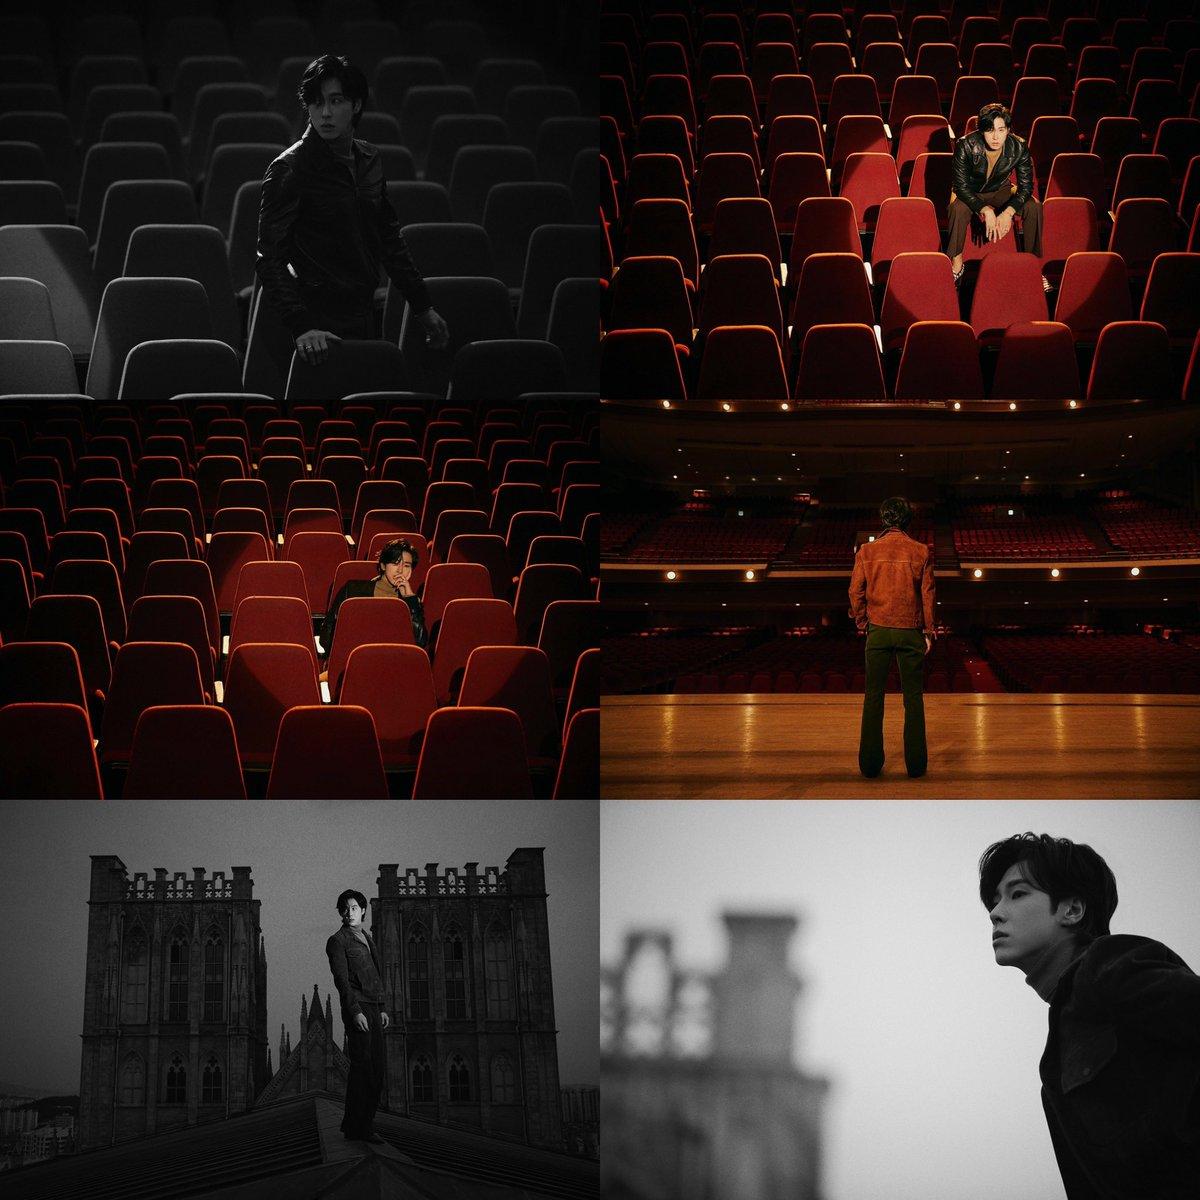 U-KNOW wanders an empty theater 'NOIR' Concept Images  #U_KNOW #유노윤호 #동방신기 #TVXQ  #東方神起 #NOIR